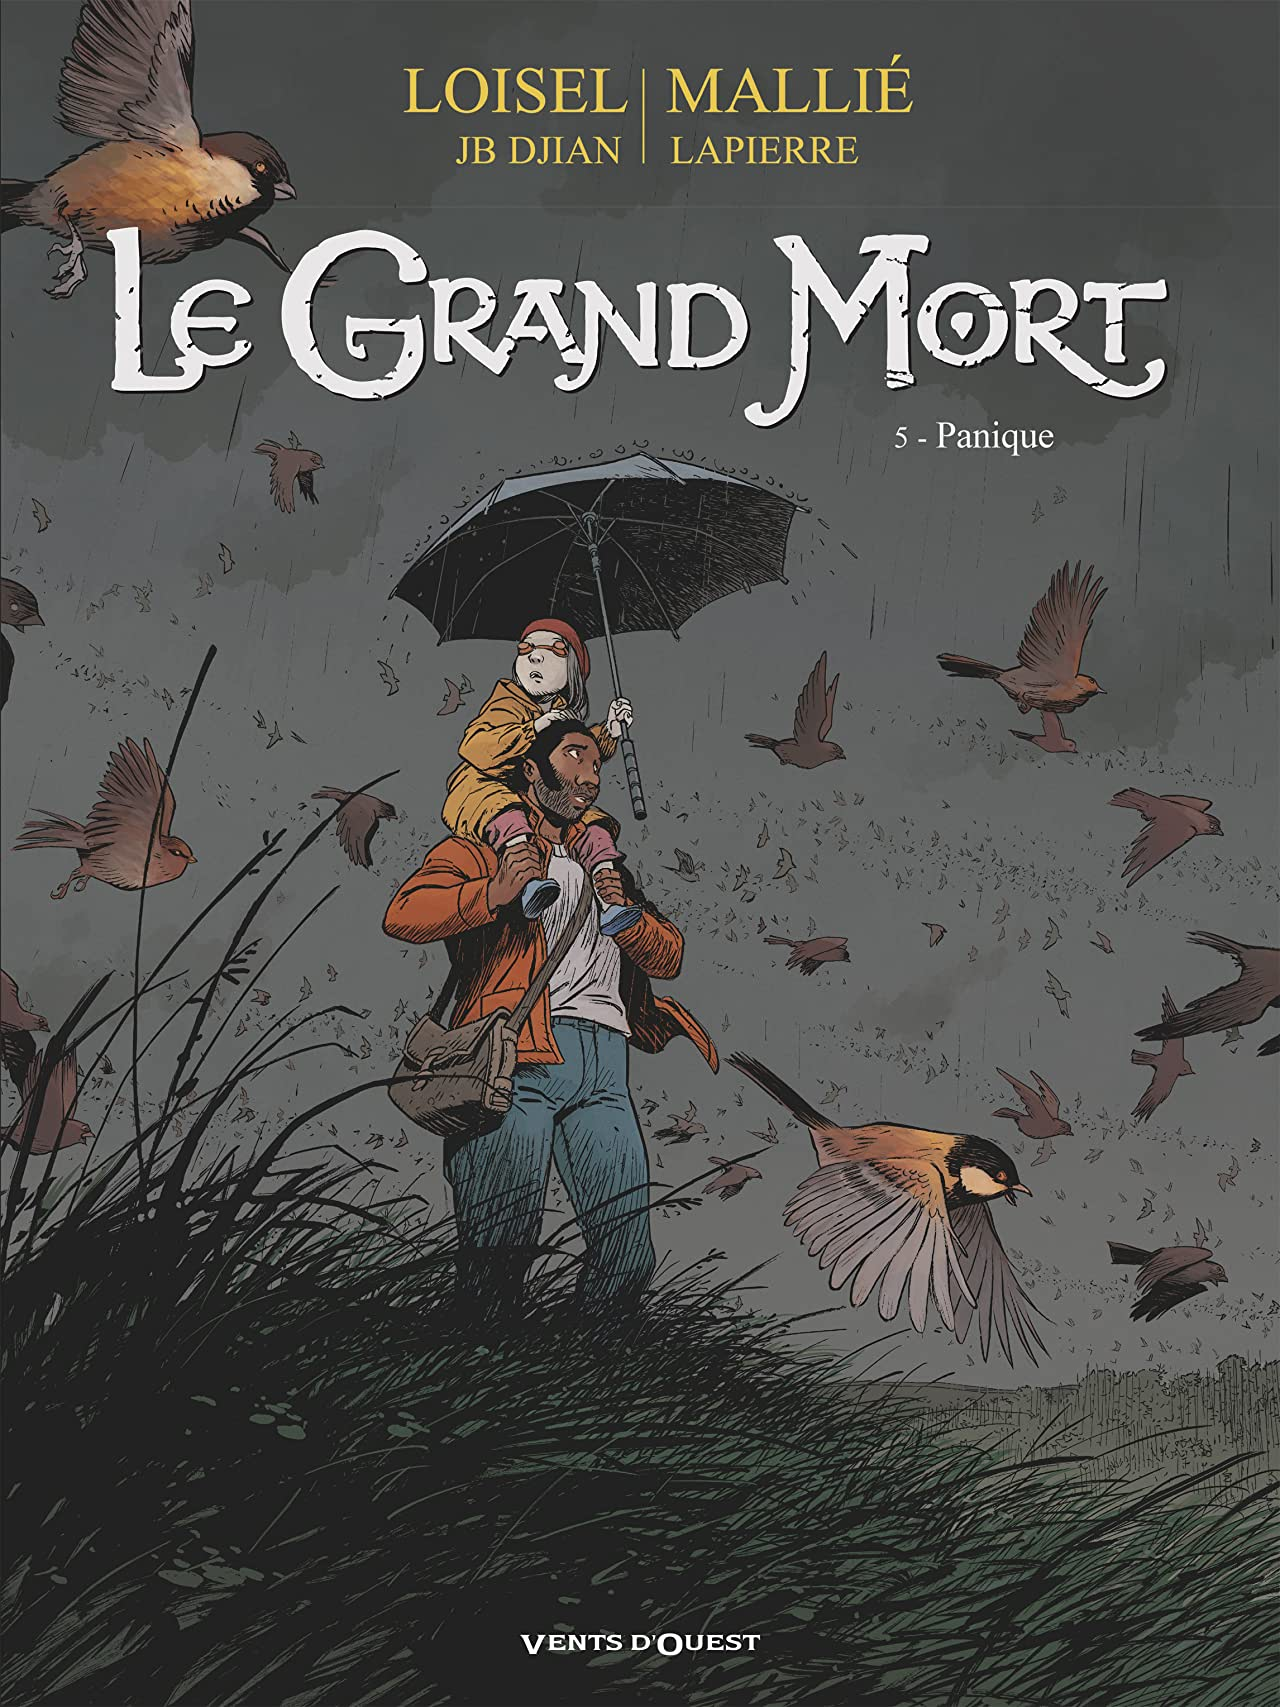 Le grand mort Vol. 5: Panique